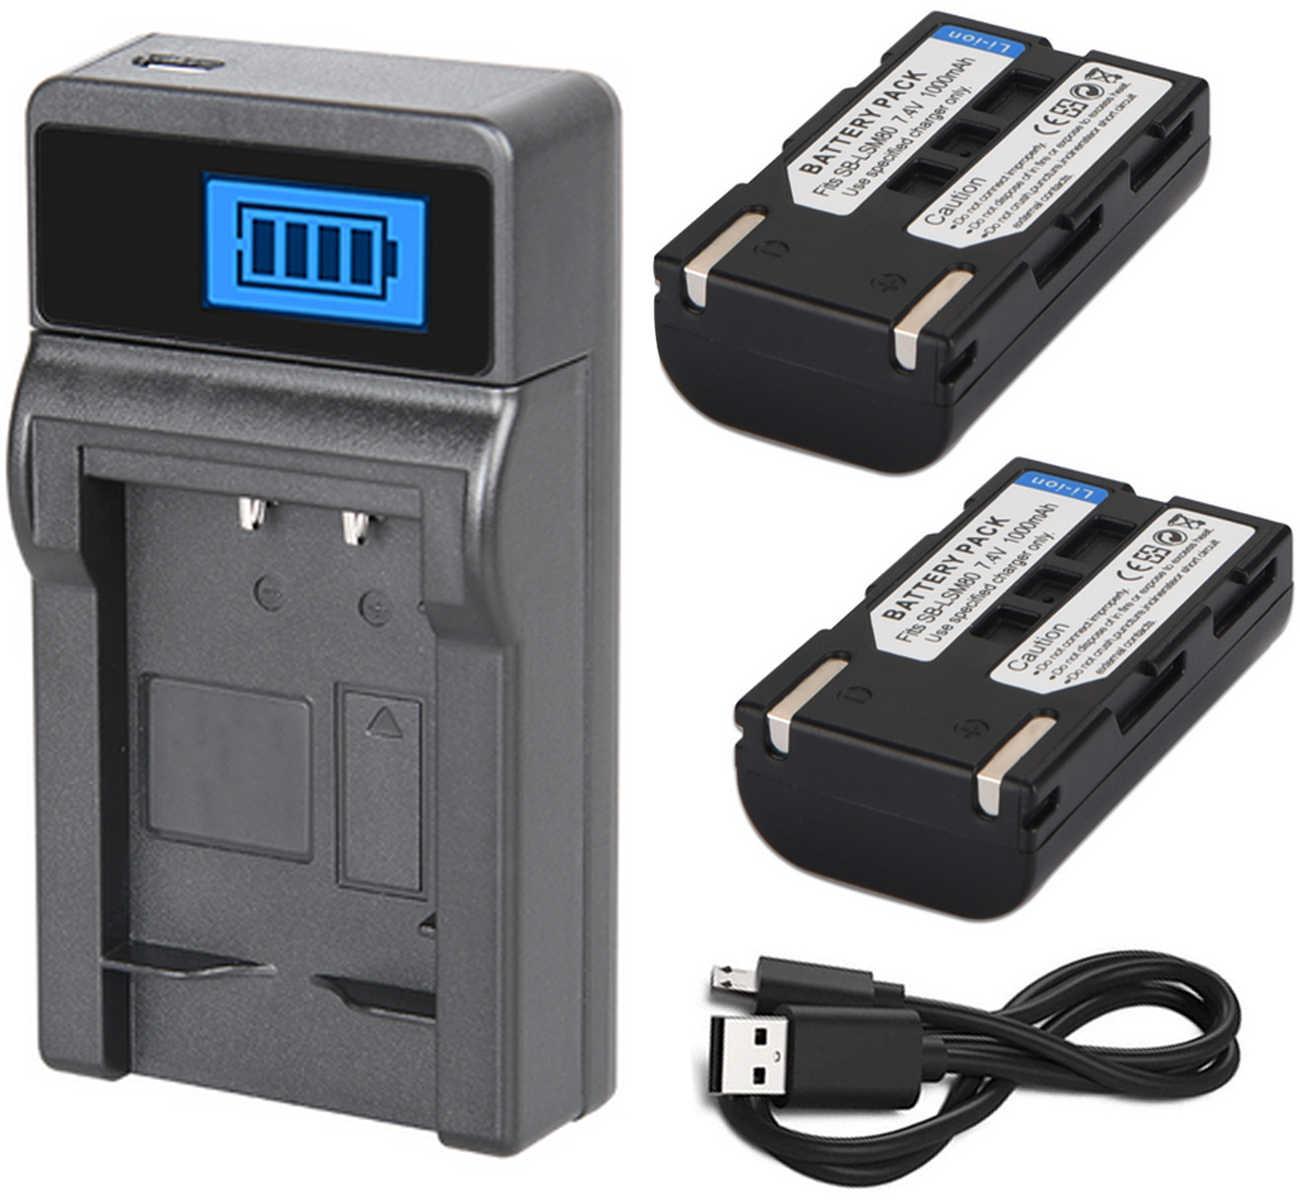 2x Batería Para SAMSUNG SB-LSM80 SB-LSM160 SB-LSM320